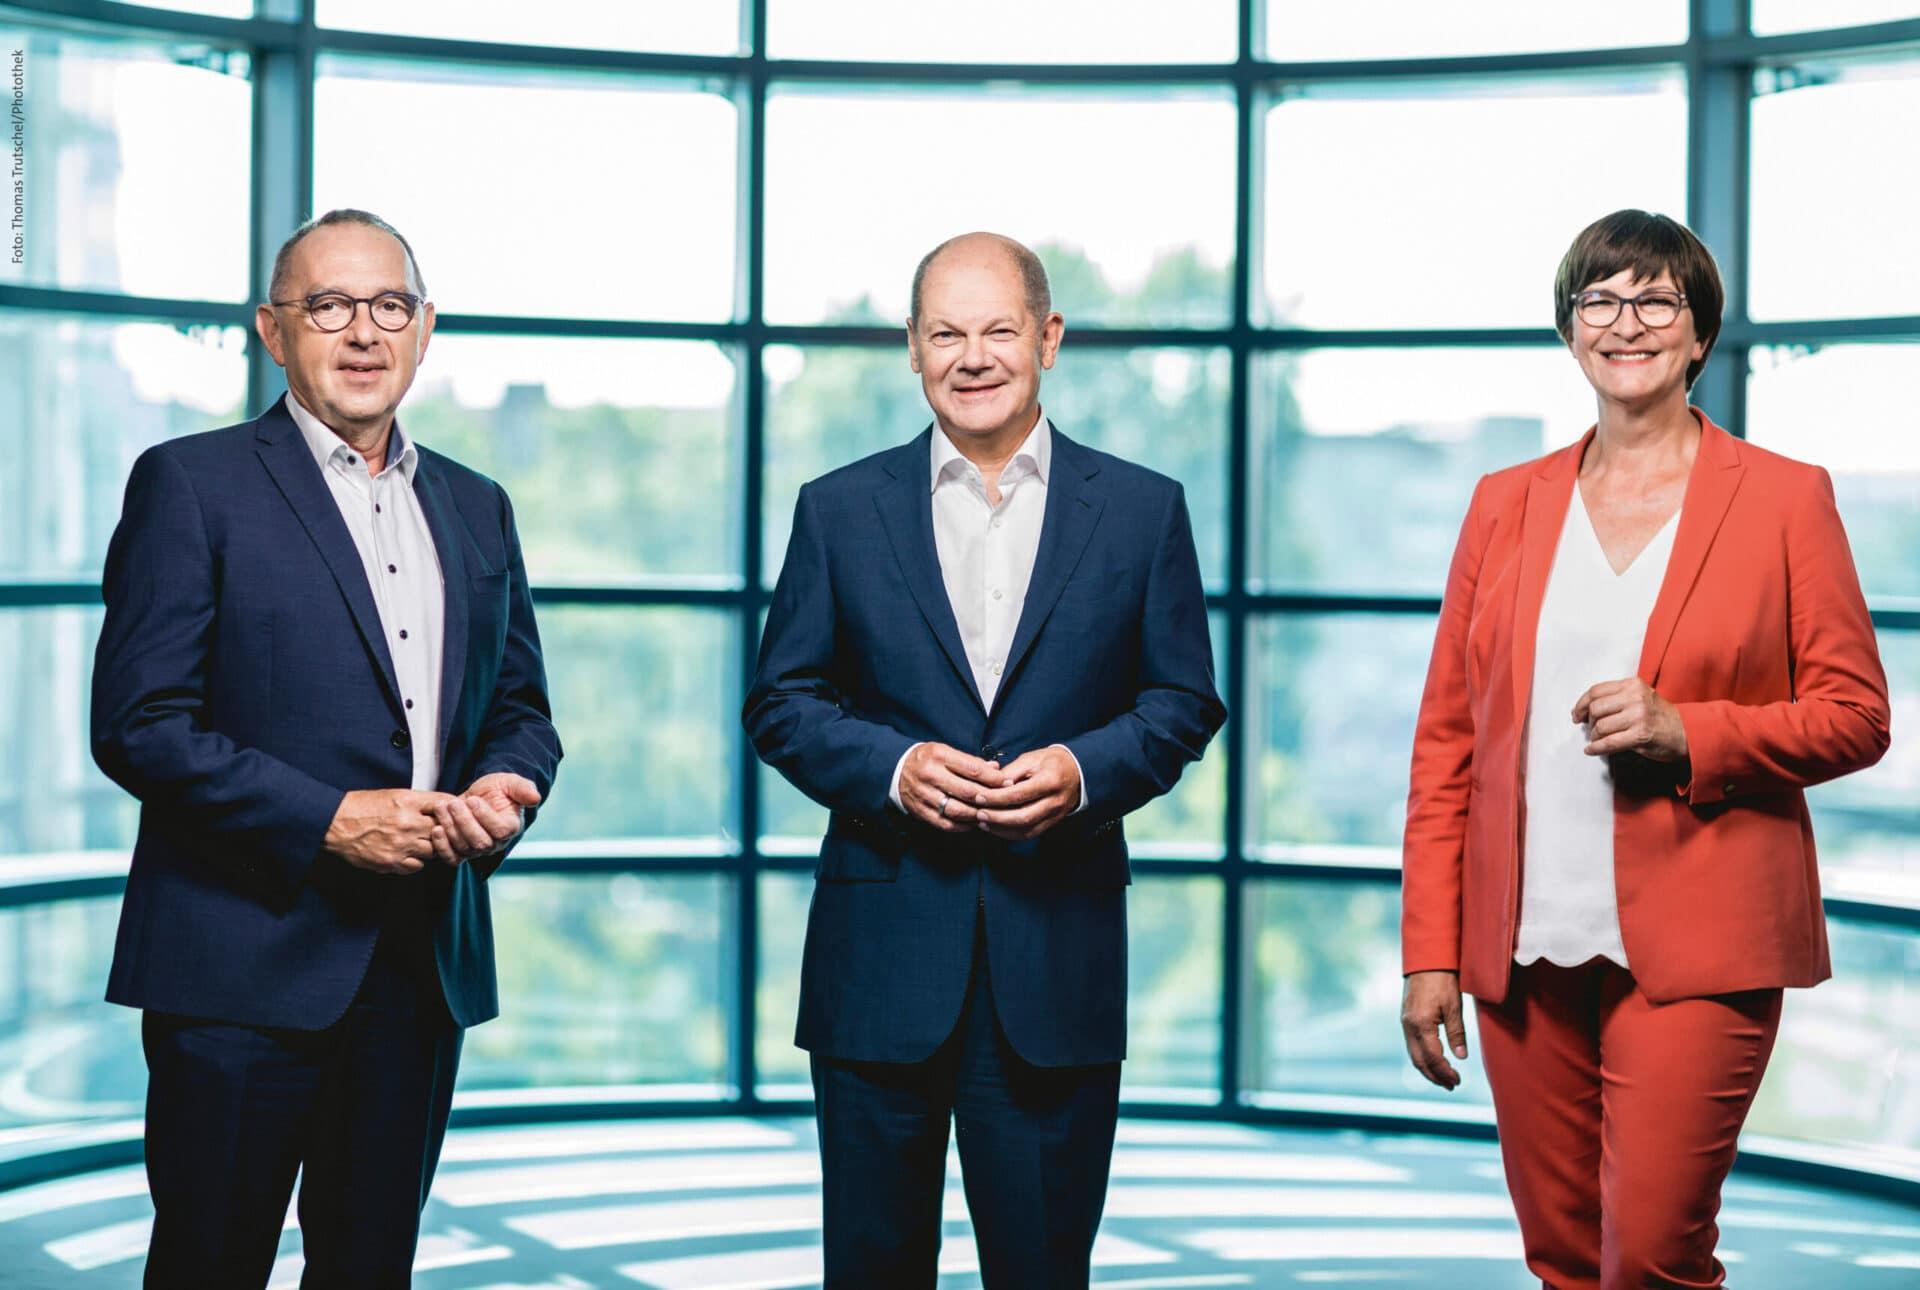 Olaf Scholz ist SPD-Kanzlerkandidat